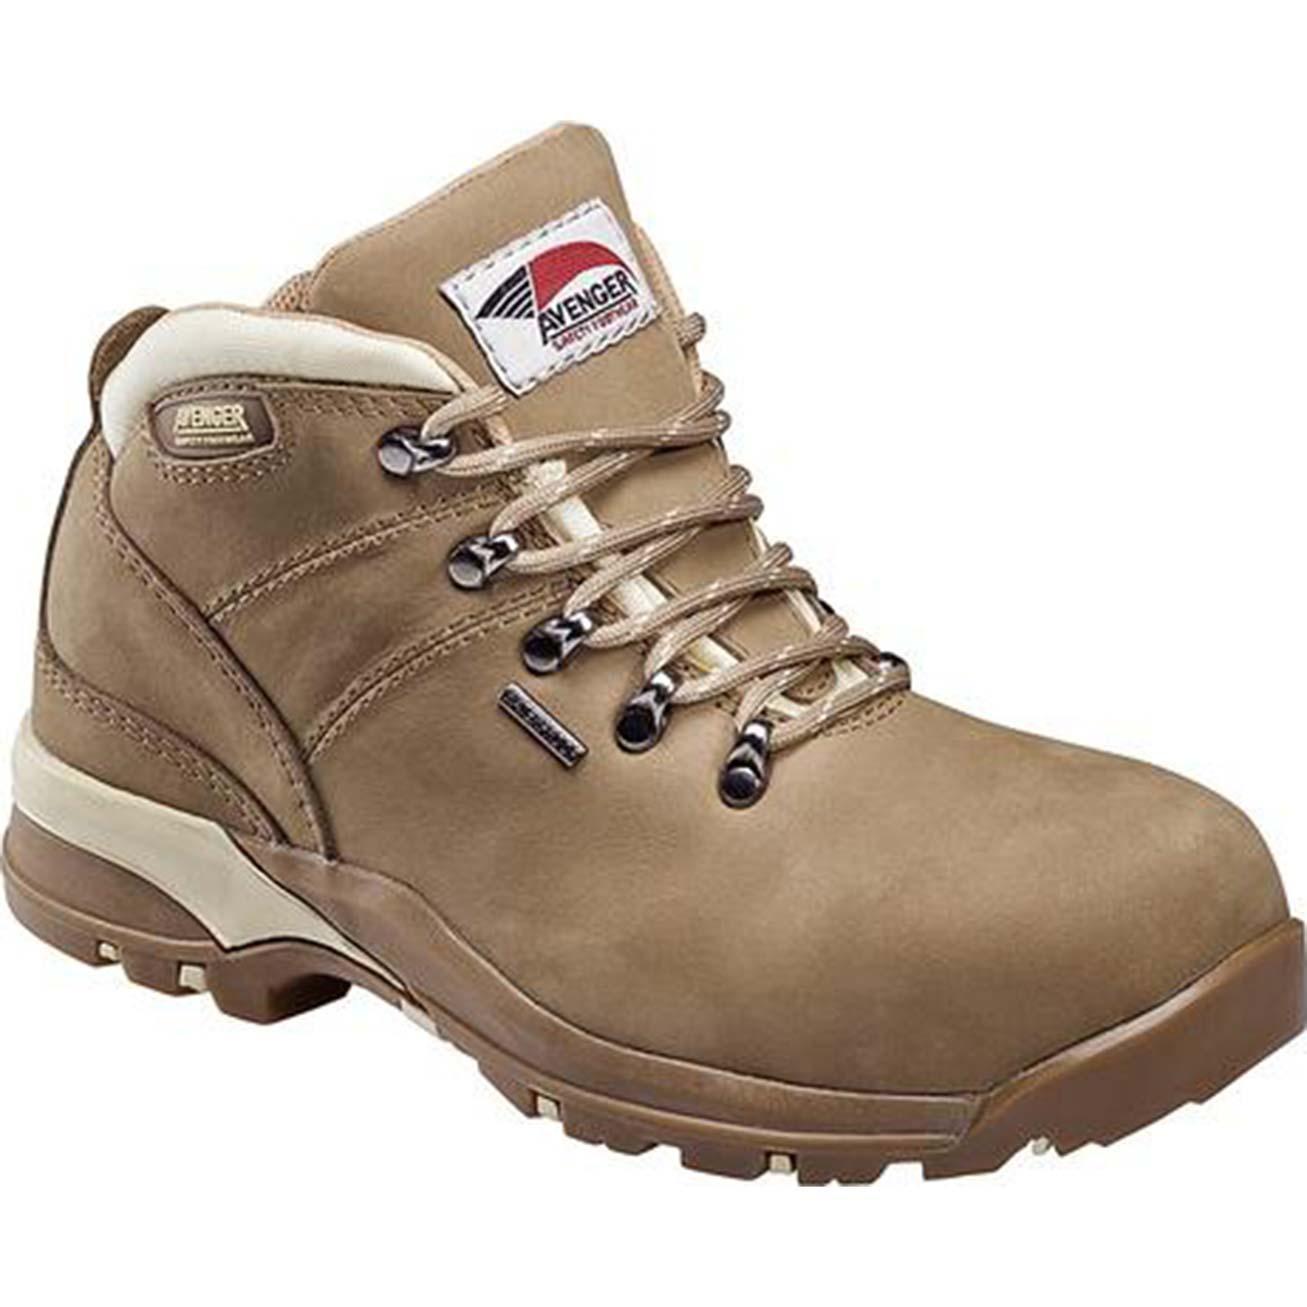 4be89c0e Avenger Women's Composite Toe Waterproof Hiker Work Boot